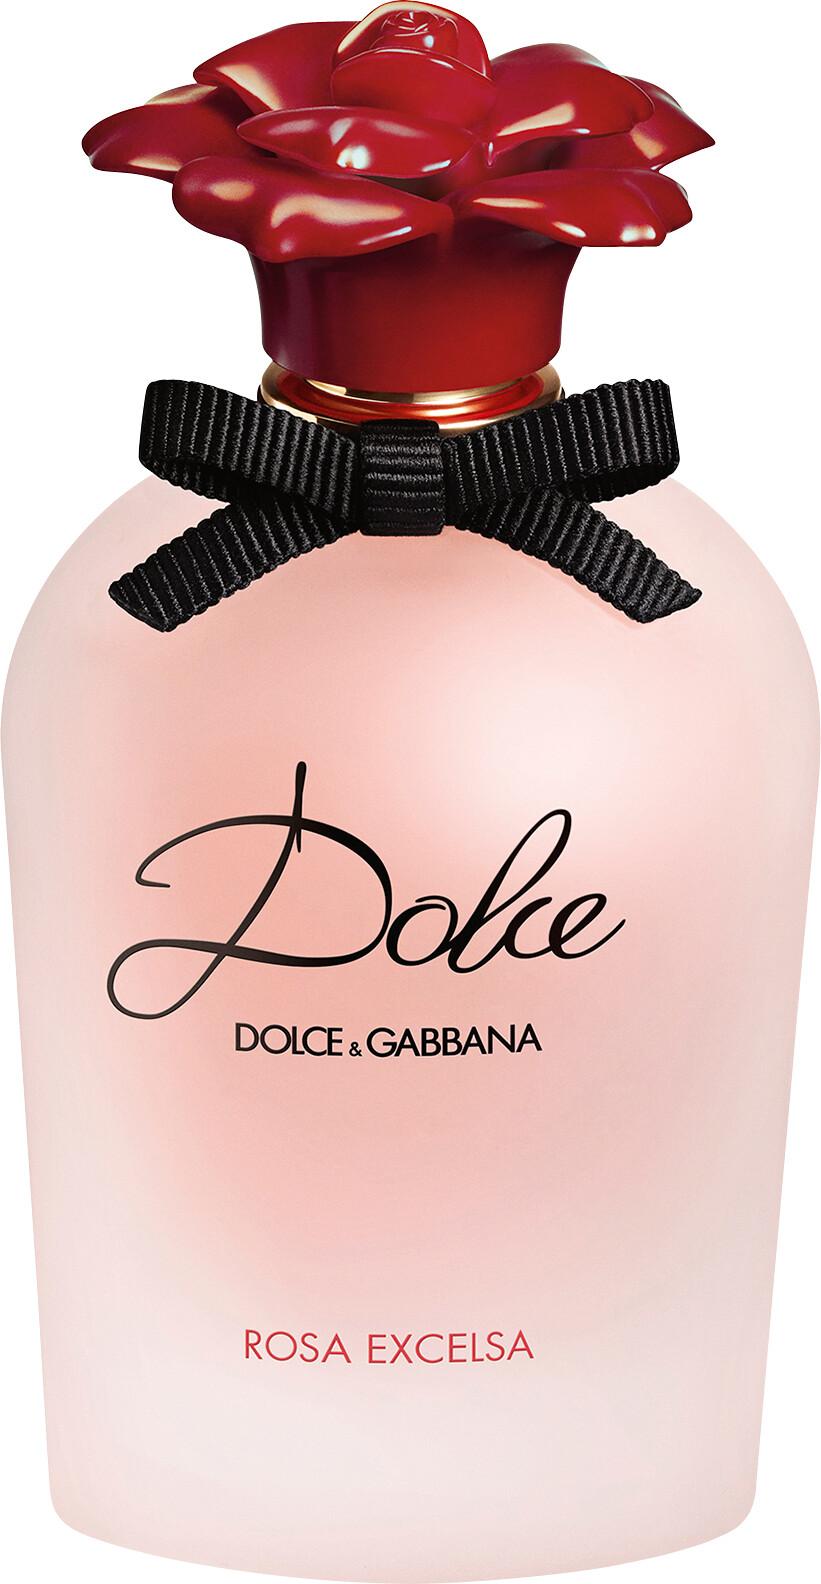 dolce gabbana dolce rosa excelsa eau de parfum spray. Black Bedroom Furniture Sets. Home Design Ideas